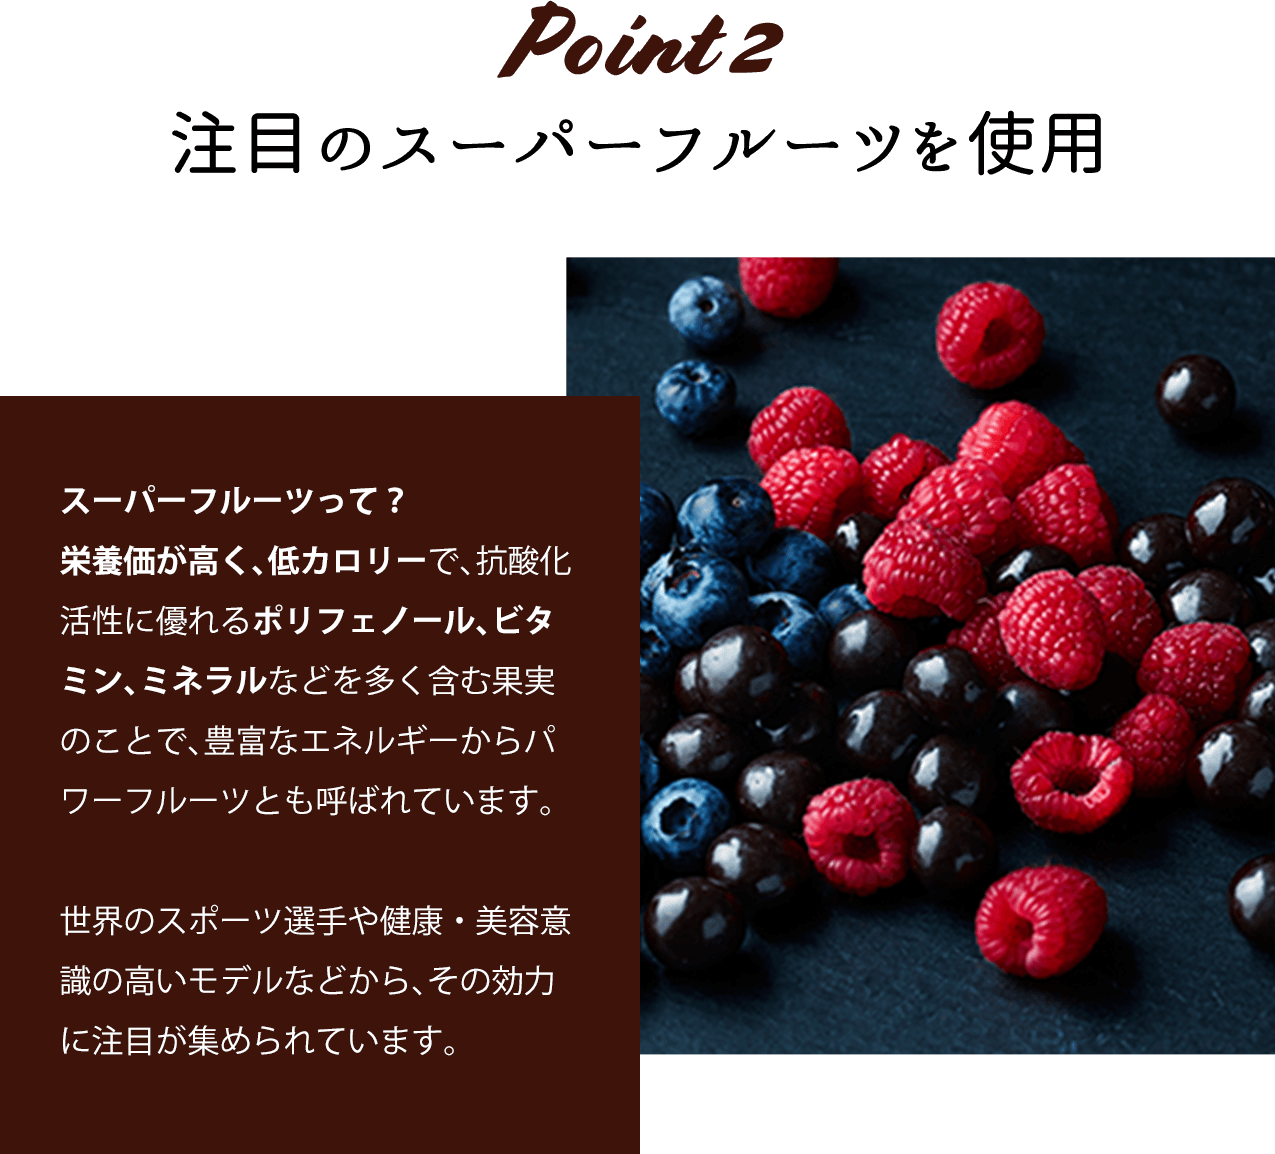 Point_2 注目のスーパーフルーツを使用